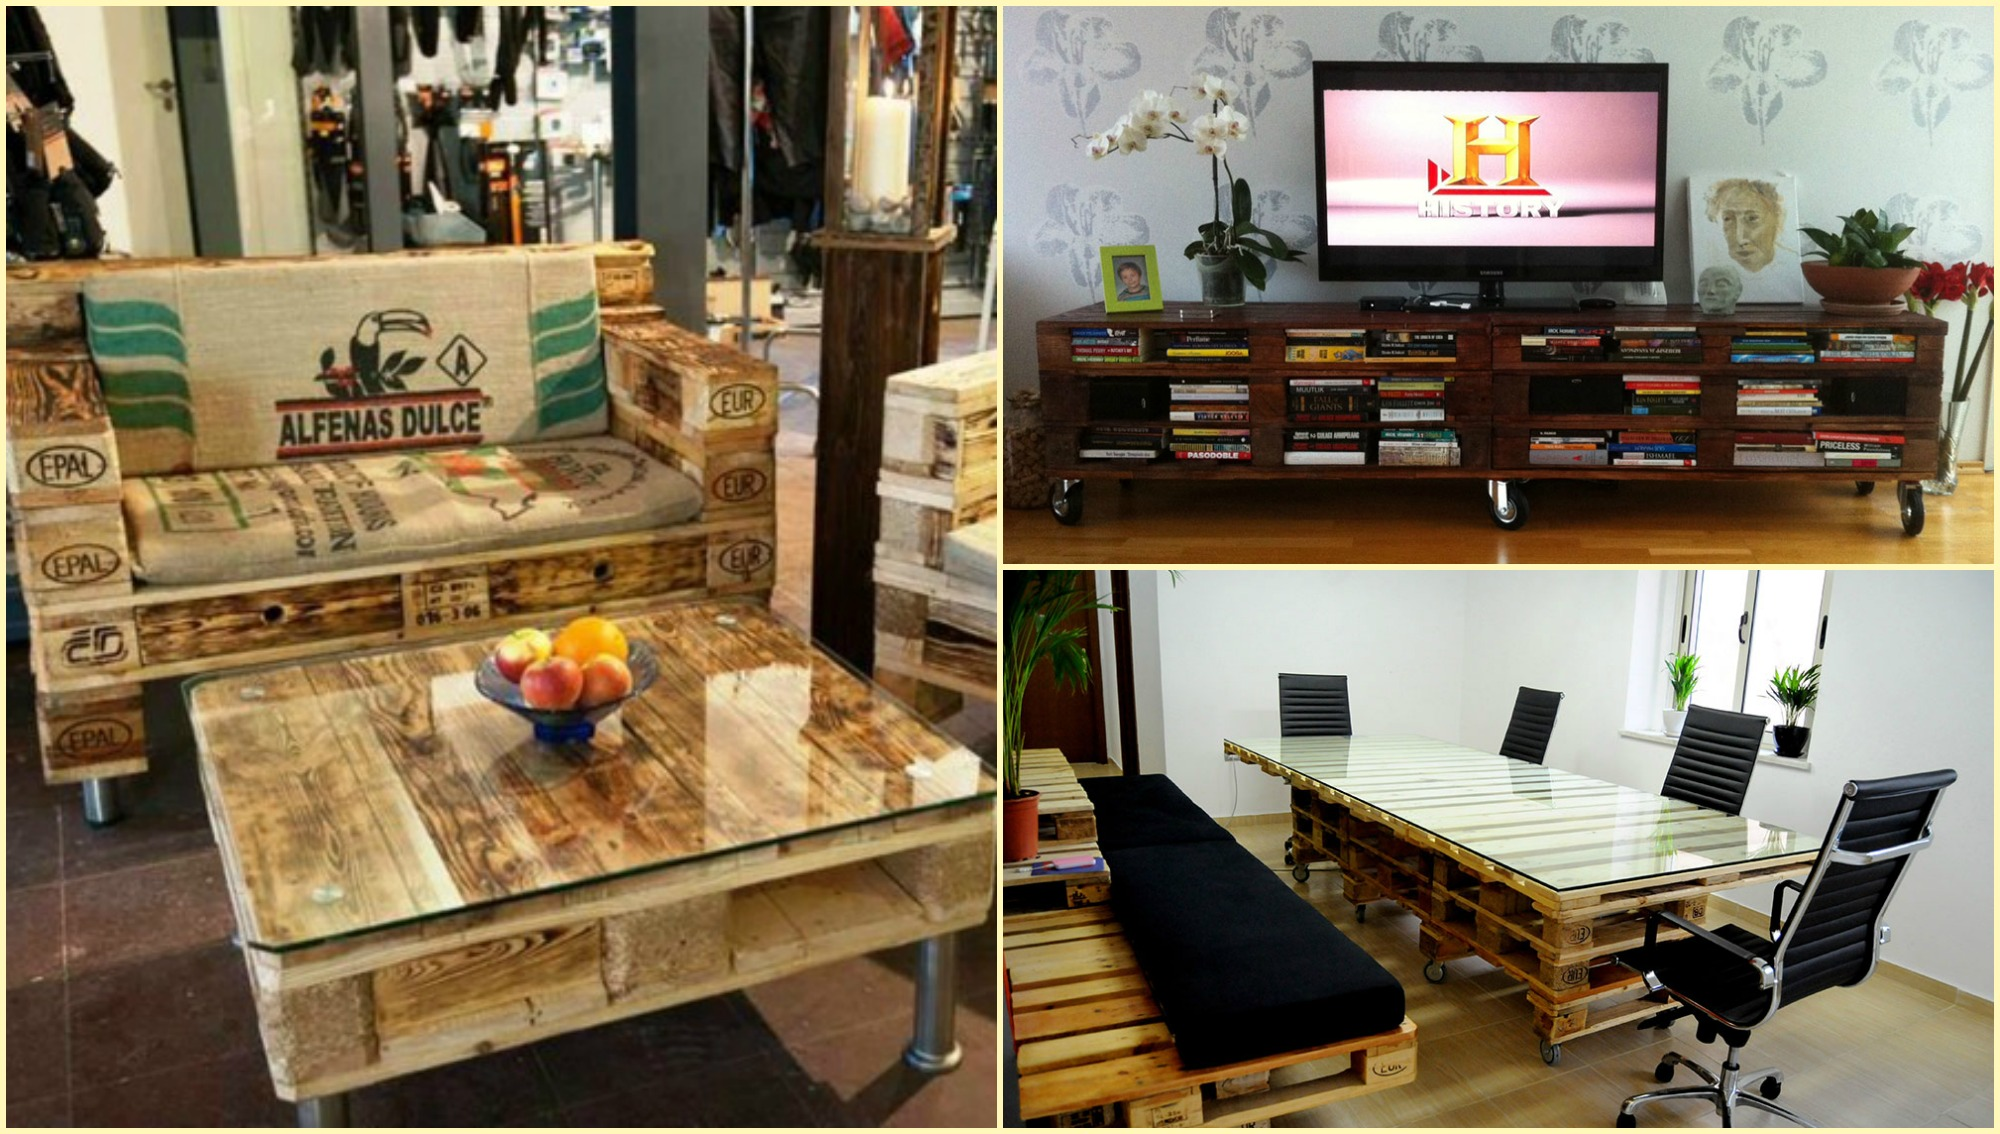 10 ideas para convertir PALLETS en increíbles muebles – Manos a la Obra